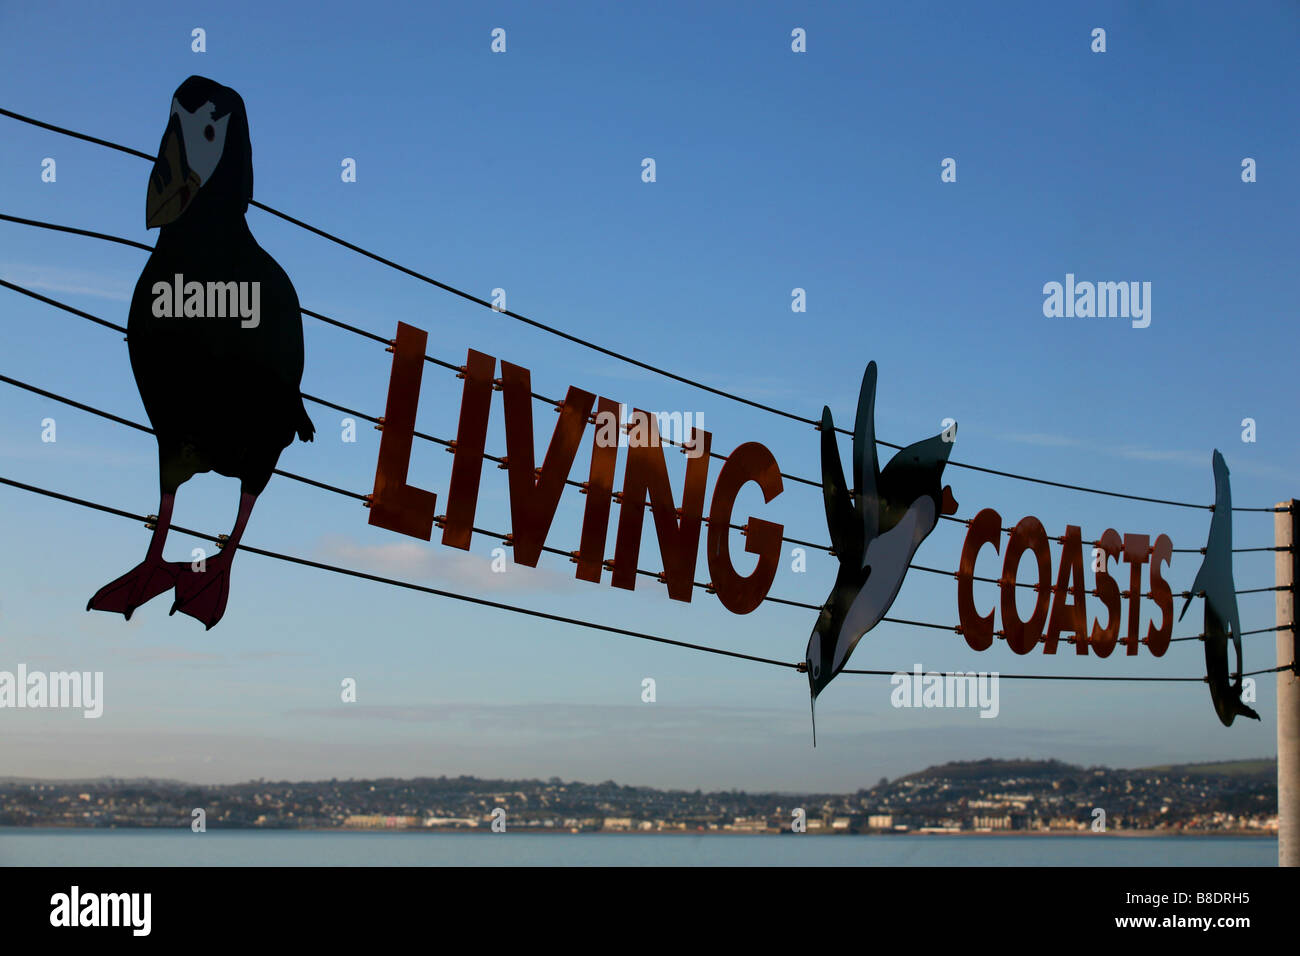 Living Coasts, Torquay Harbour, Devon, UK - Stock Image